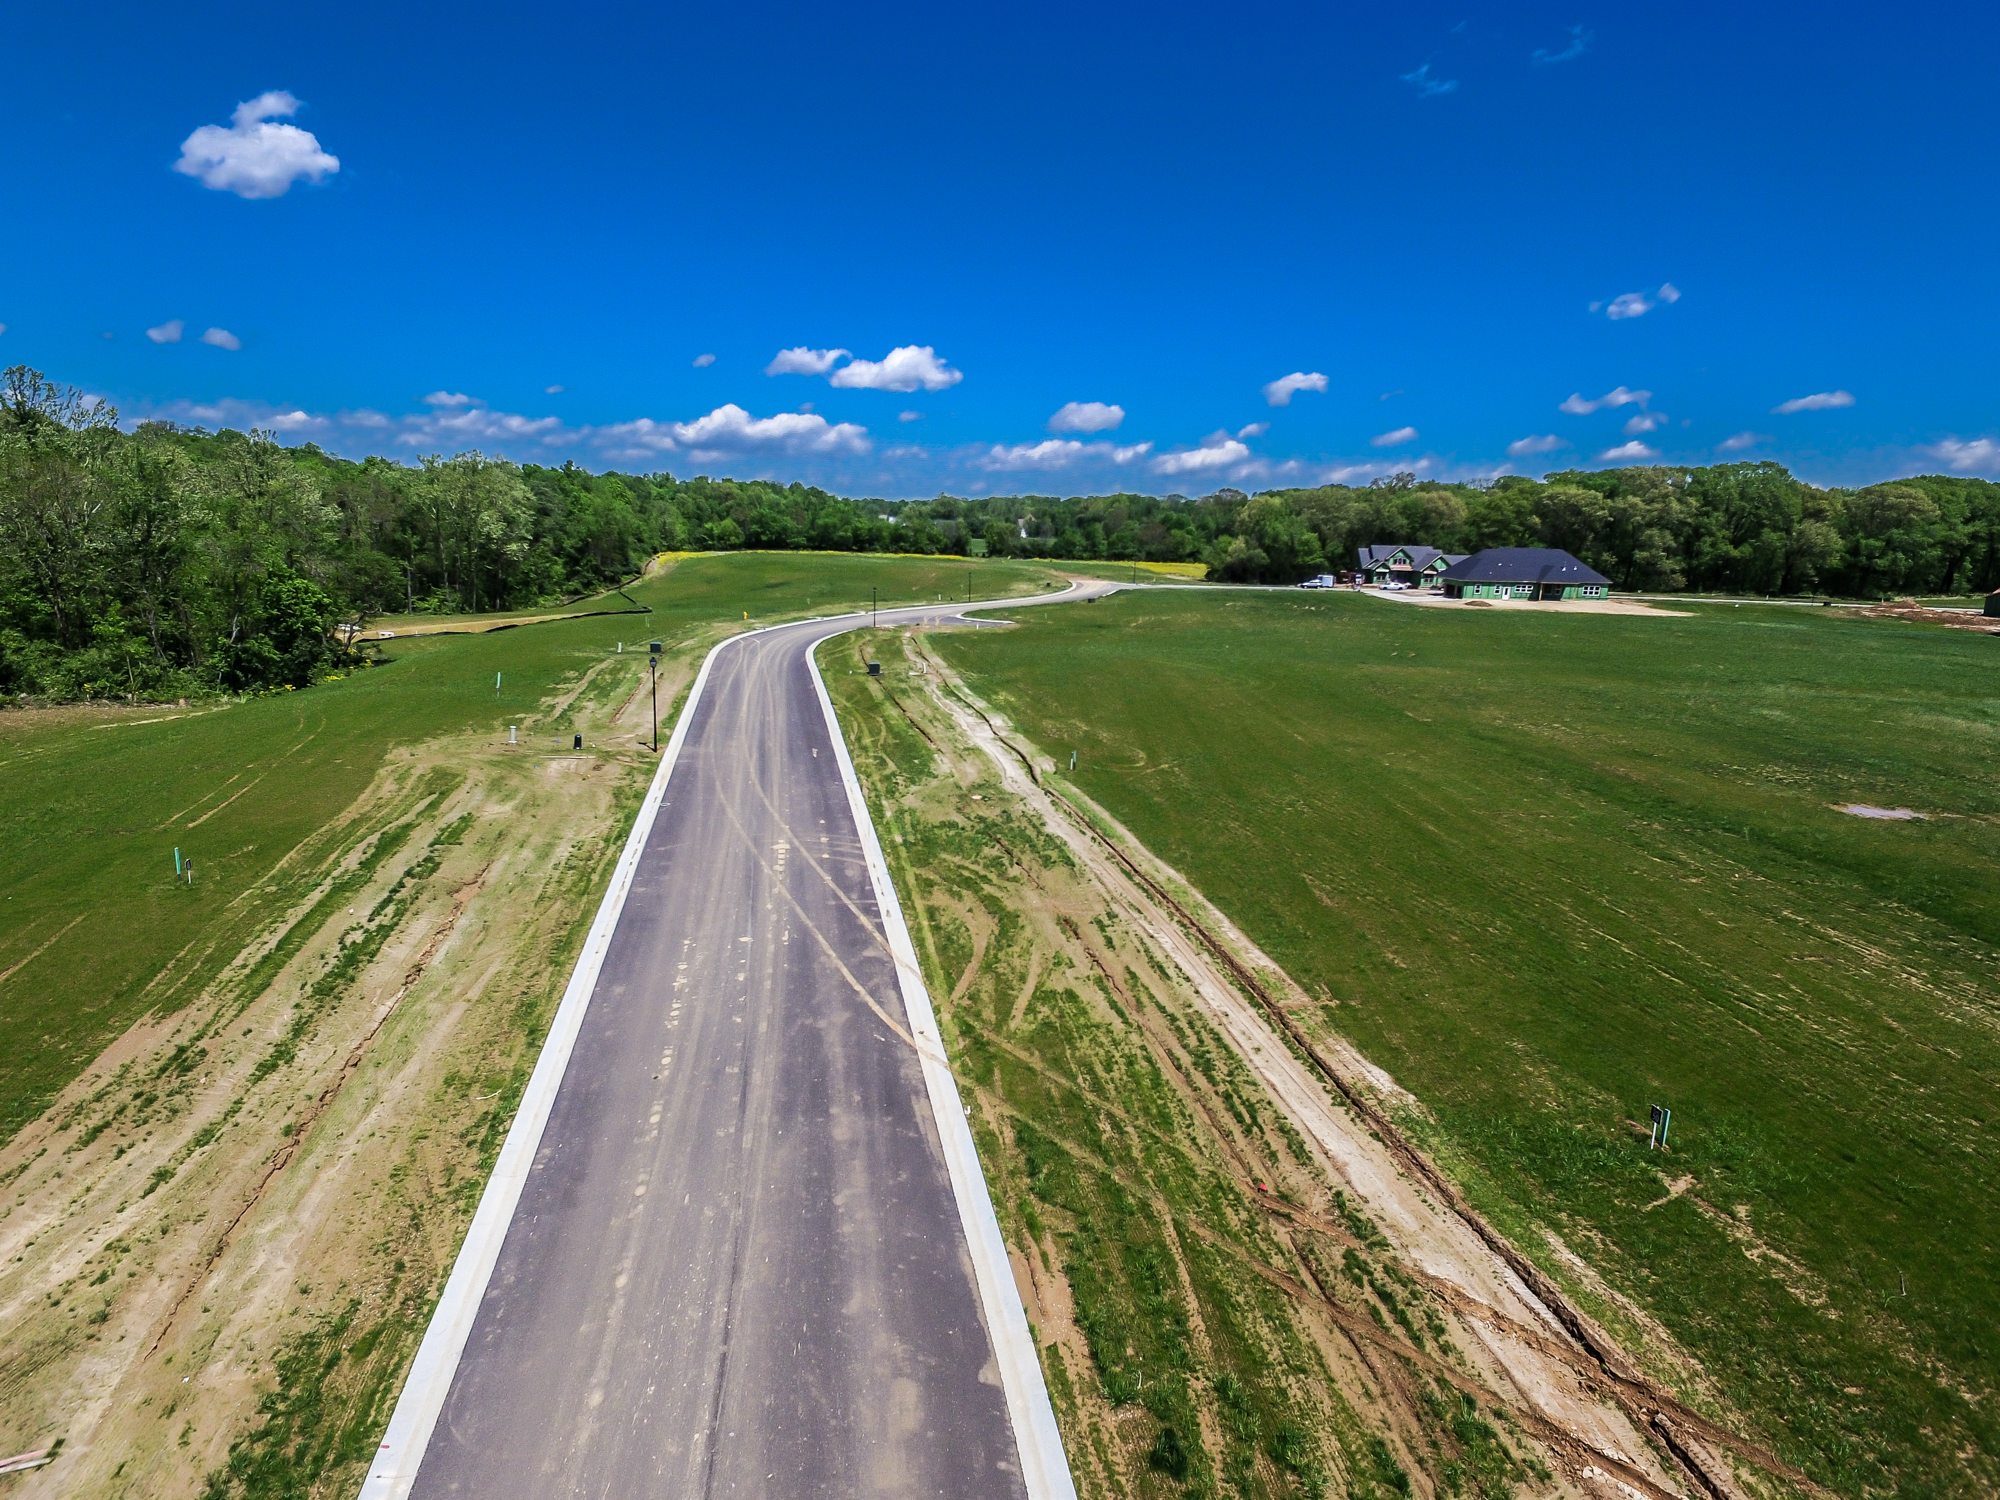 Bethel_Ridge_Farms_O'Fallon_Illinois_Aerials_Progress_5.3.17-12.jpg